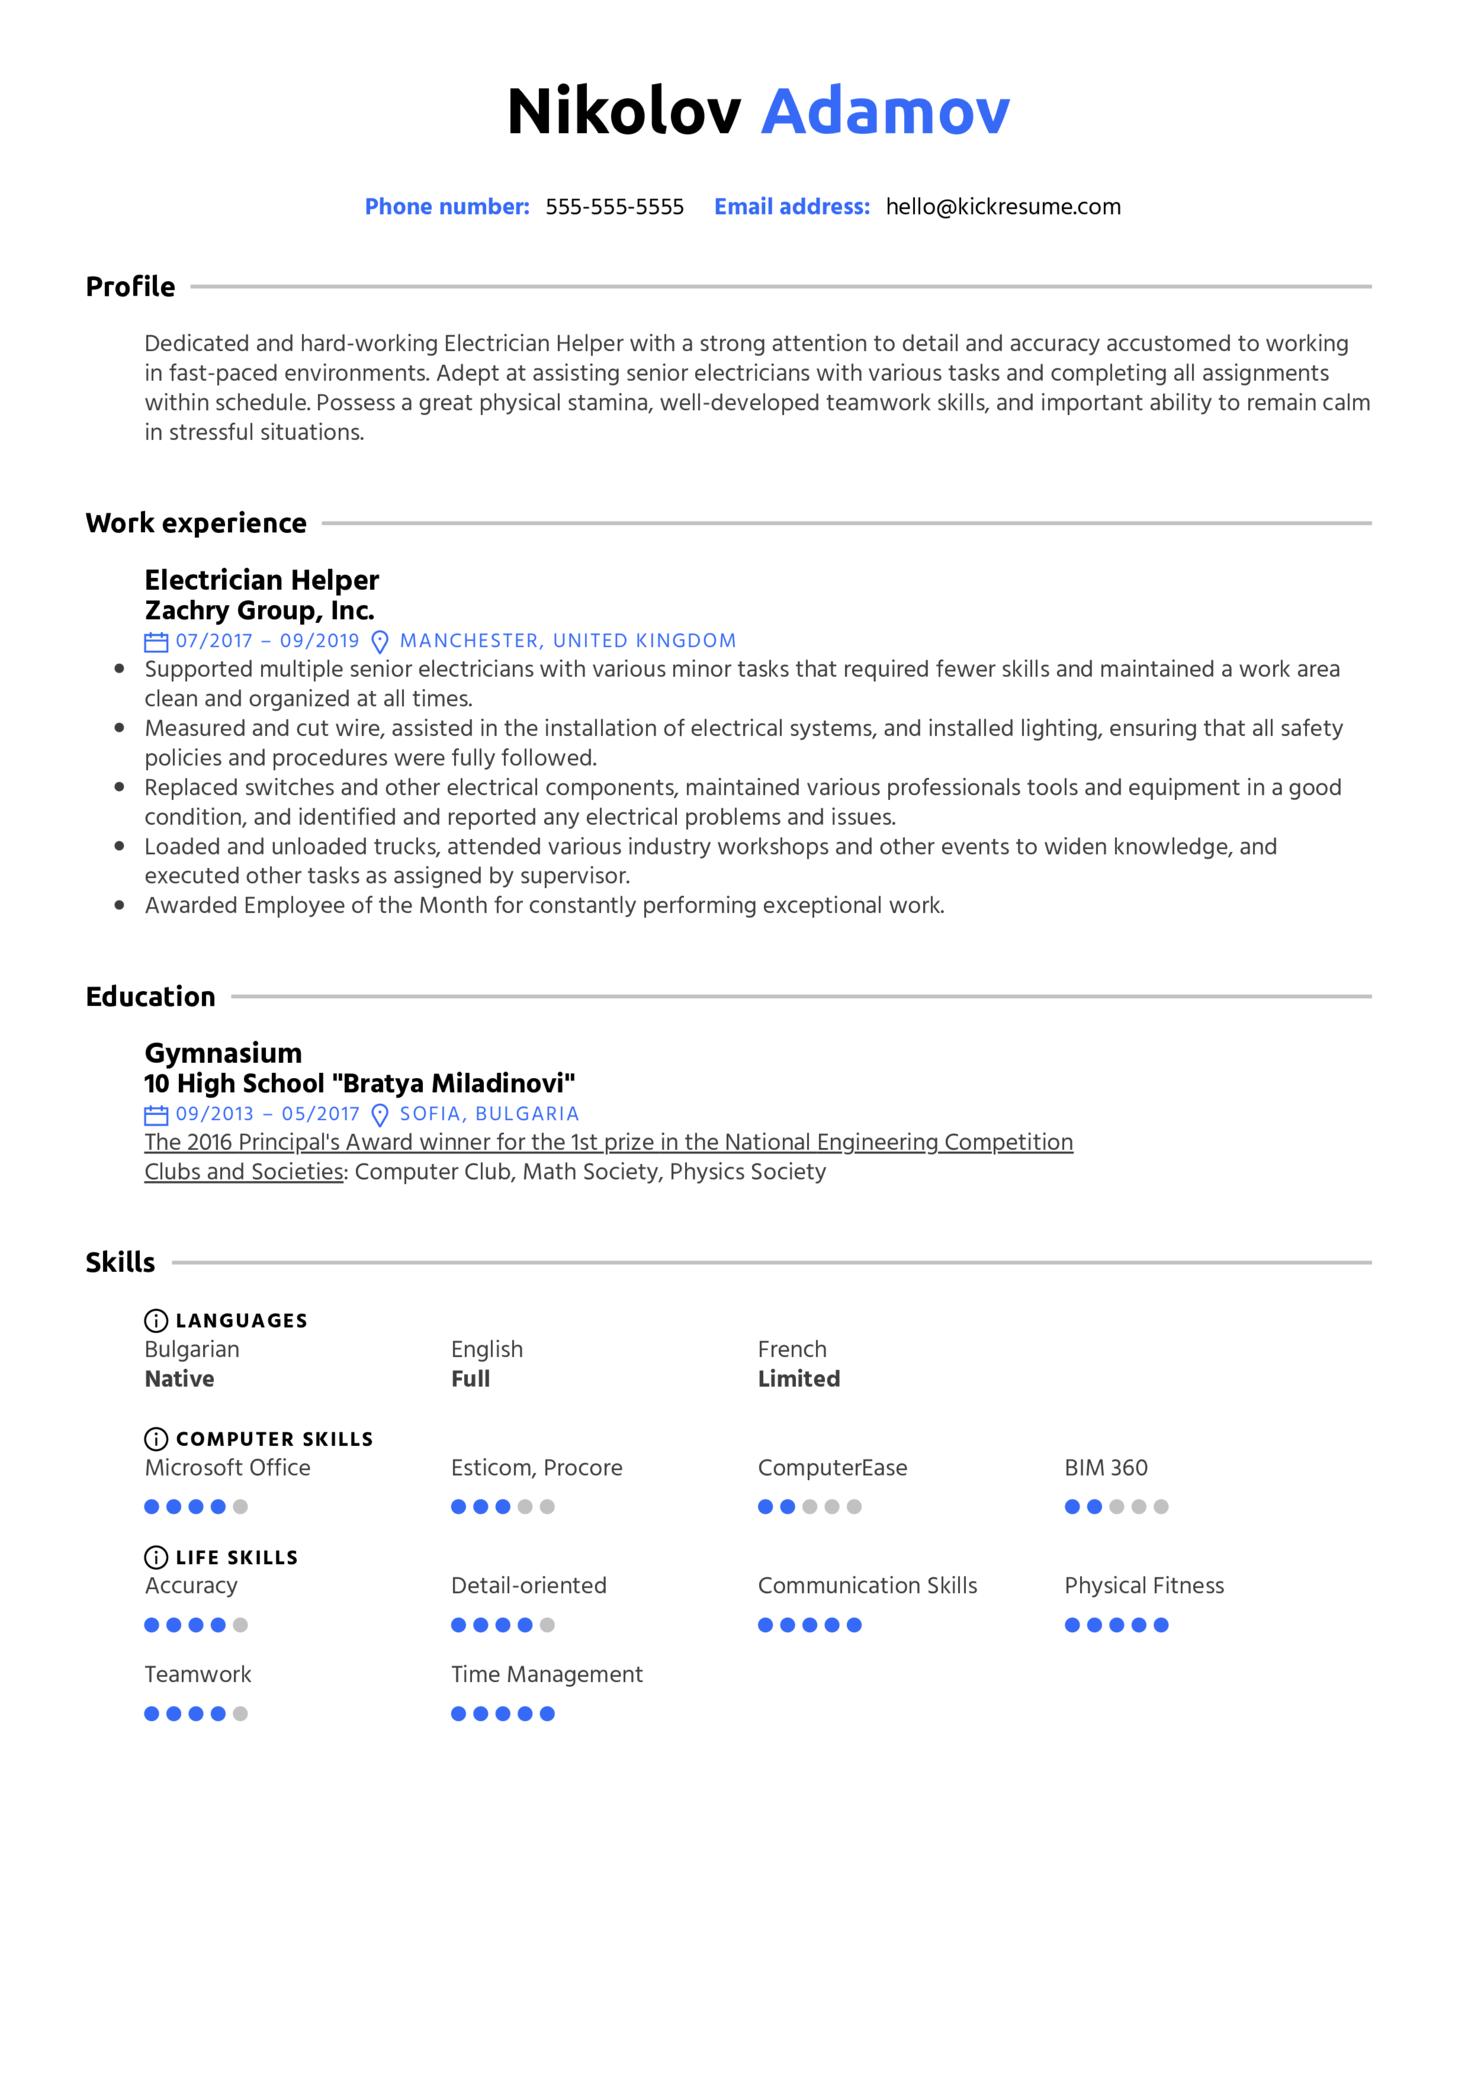 Electrician Helper Resume Sample (Part 1)